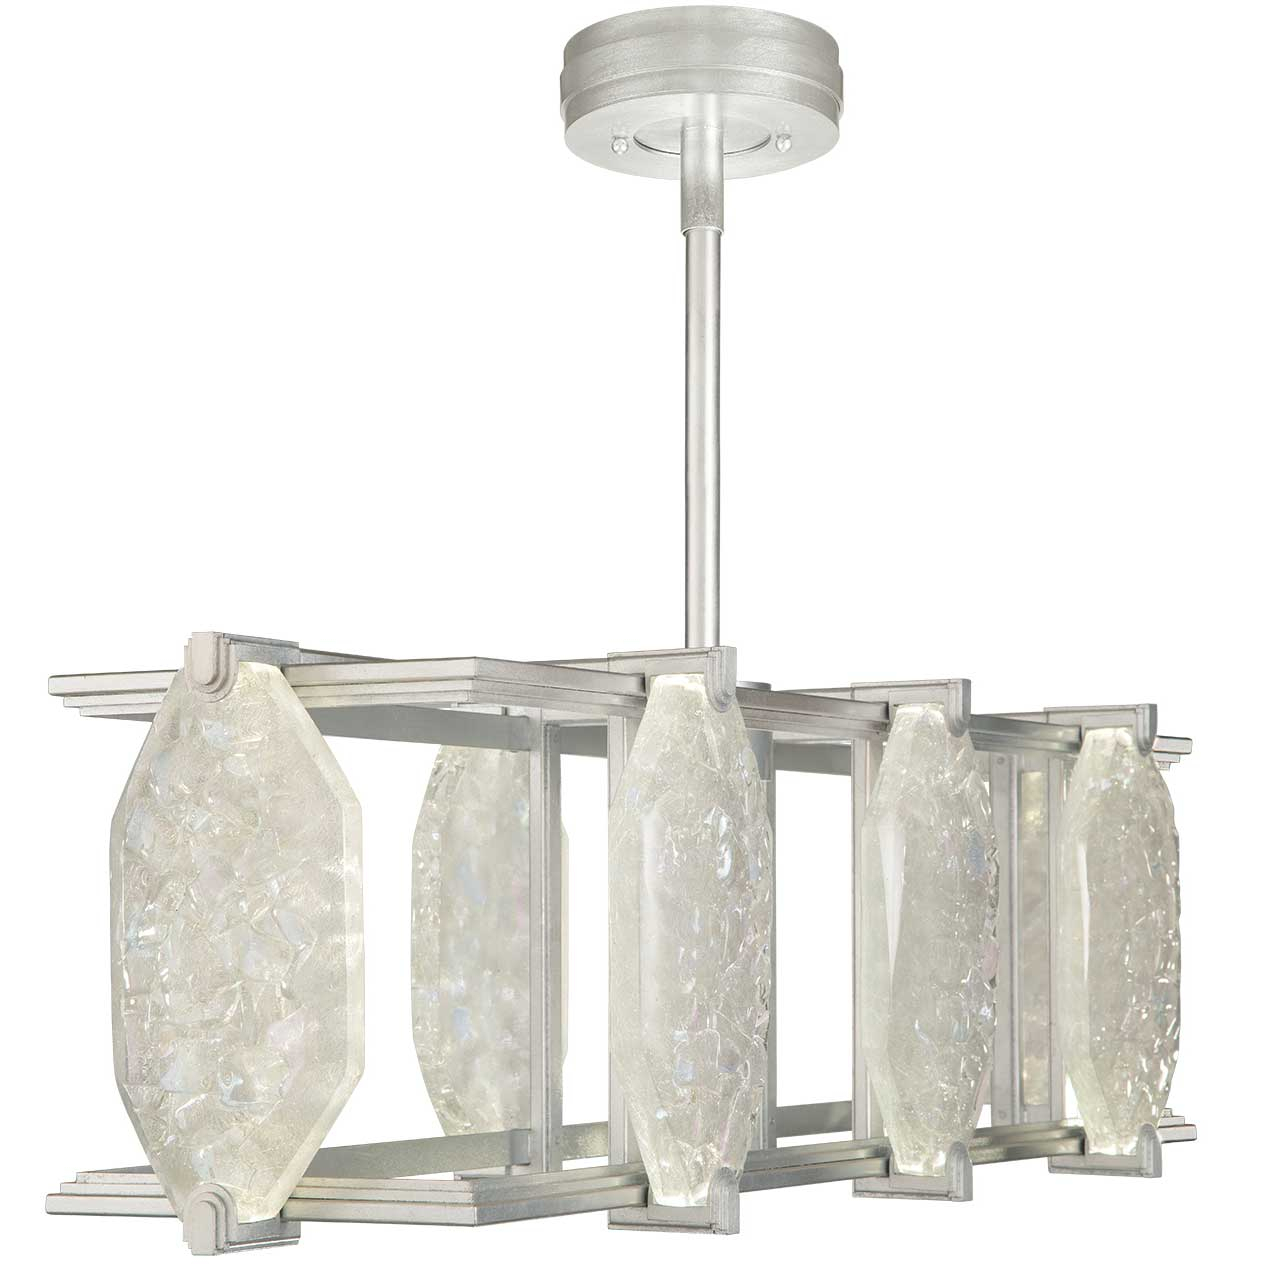 Allison Paladino Rectangular Pendantfine Art Lamps   897240 11st Throughout Paladino 6 Light Chandeliers (View 23 of 30)